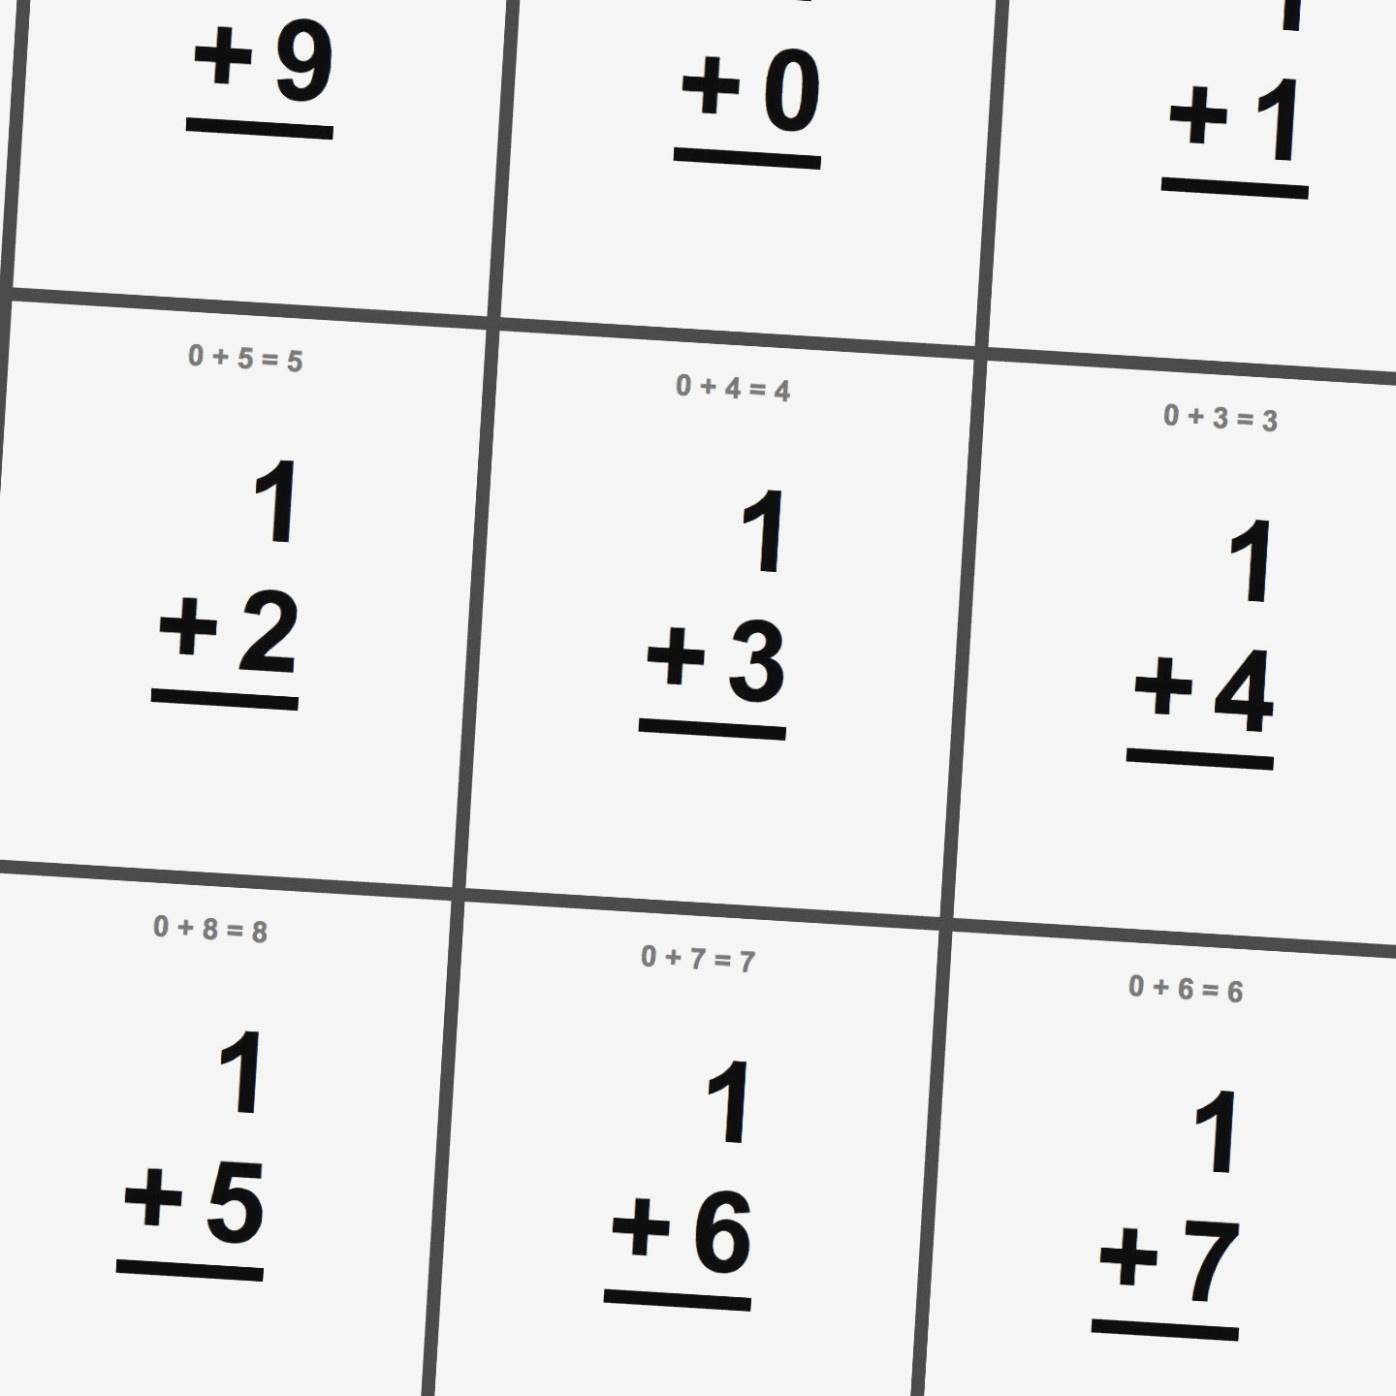 Seven Great Multiplication Flash Cards Pdf | Card Information - Free Printable Multiplication Flash Cards Pdf